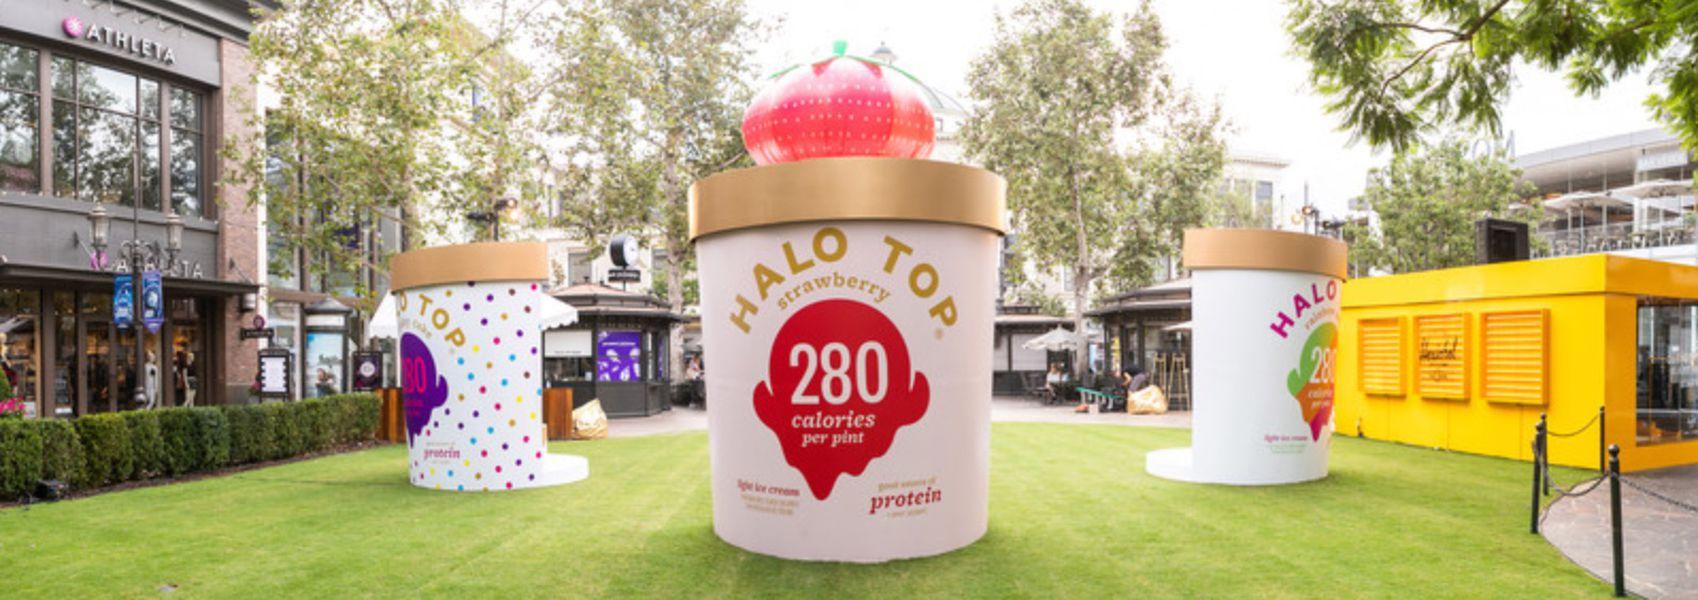 Halo Top Creamery Store Opening